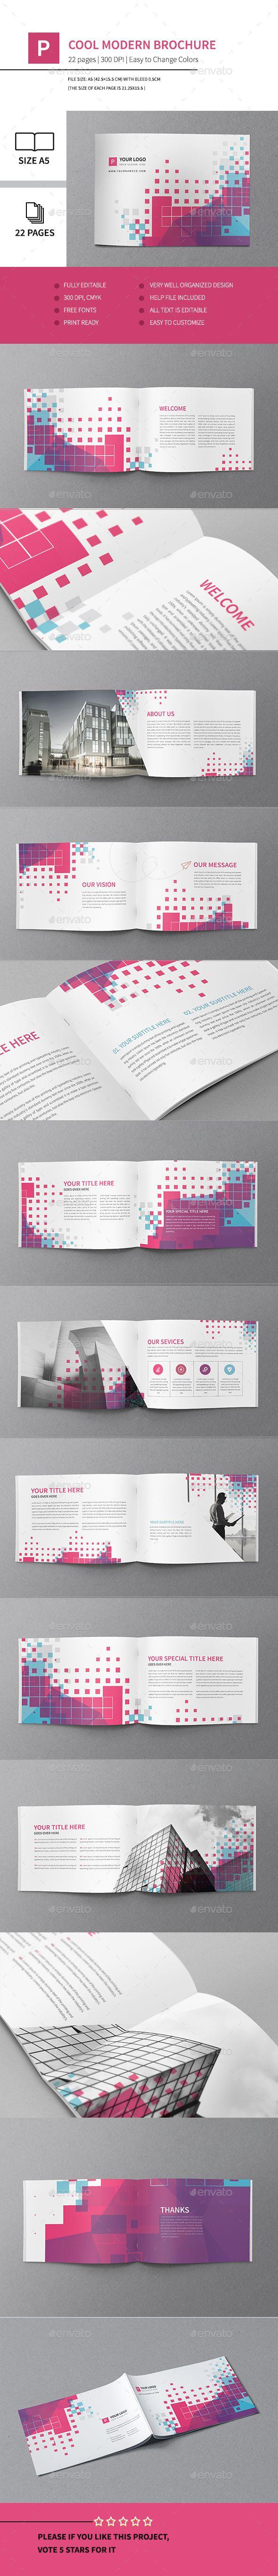 Cool Modern Brochure Template PSD #design Download: http://graphicriver.net/item/cool-modern-brochure/13265711?ref=ksioks